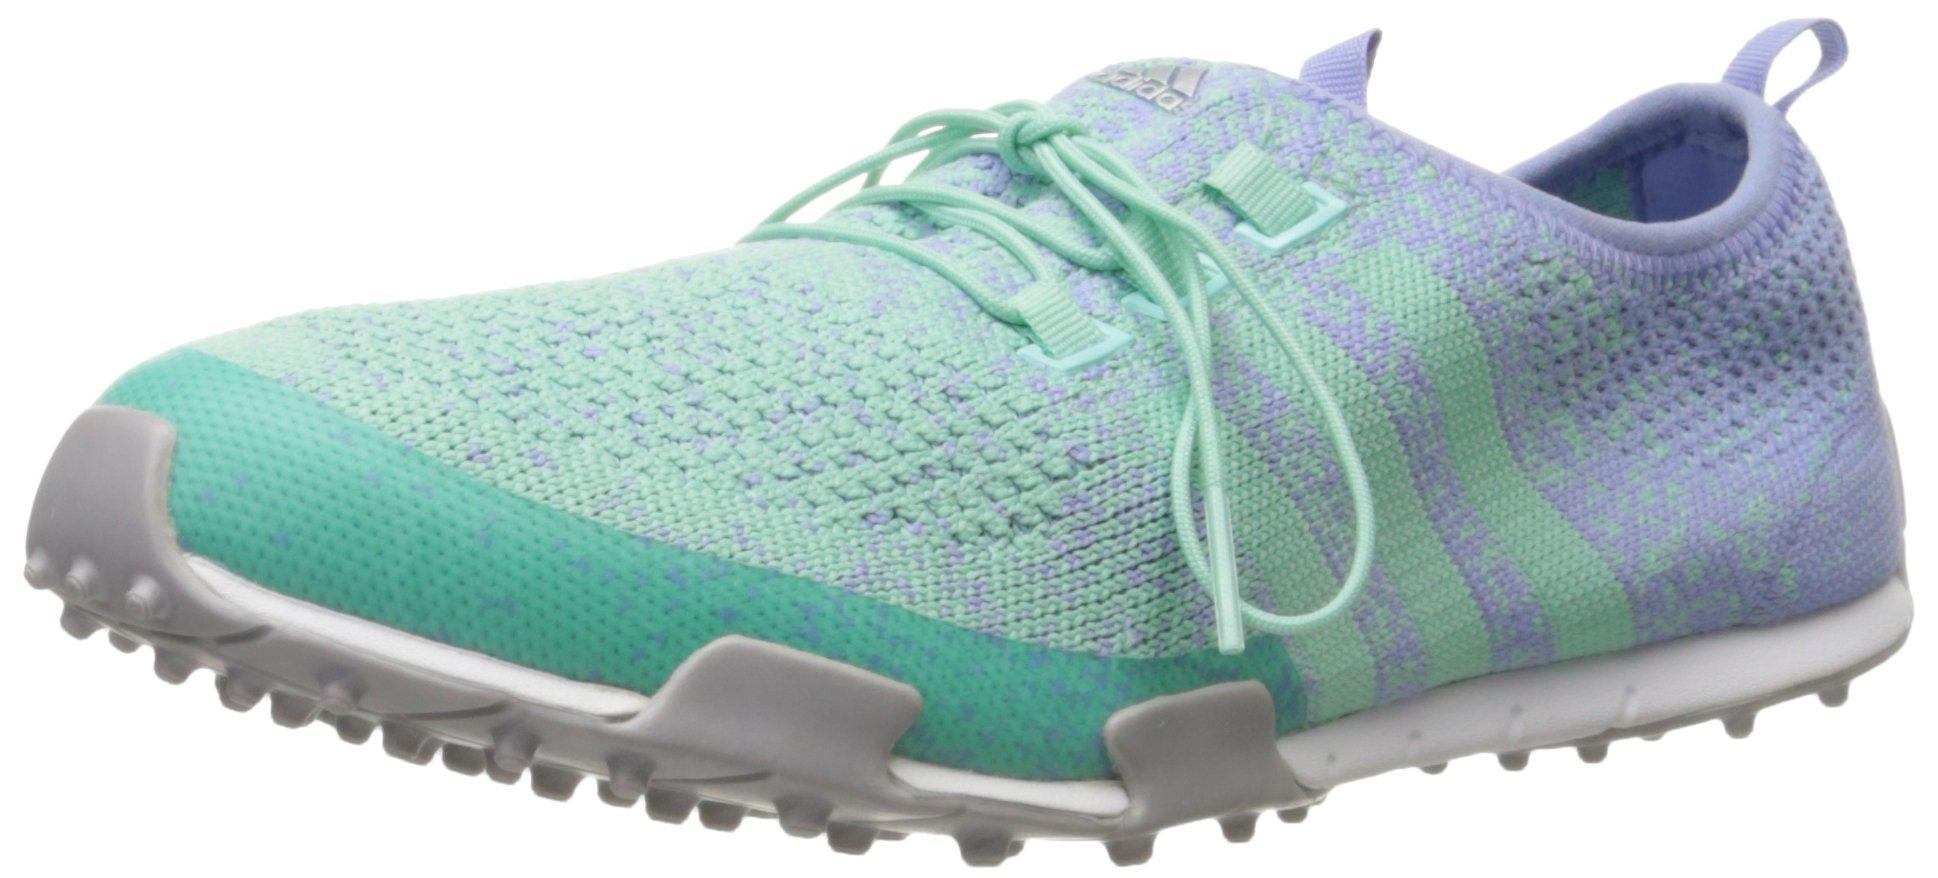 adidas Women's Ballerina Primeknit Golf Spikeless, Mint Burst-TMAG/Lavender Mist-TMAG/Silver Metallic,8 M US